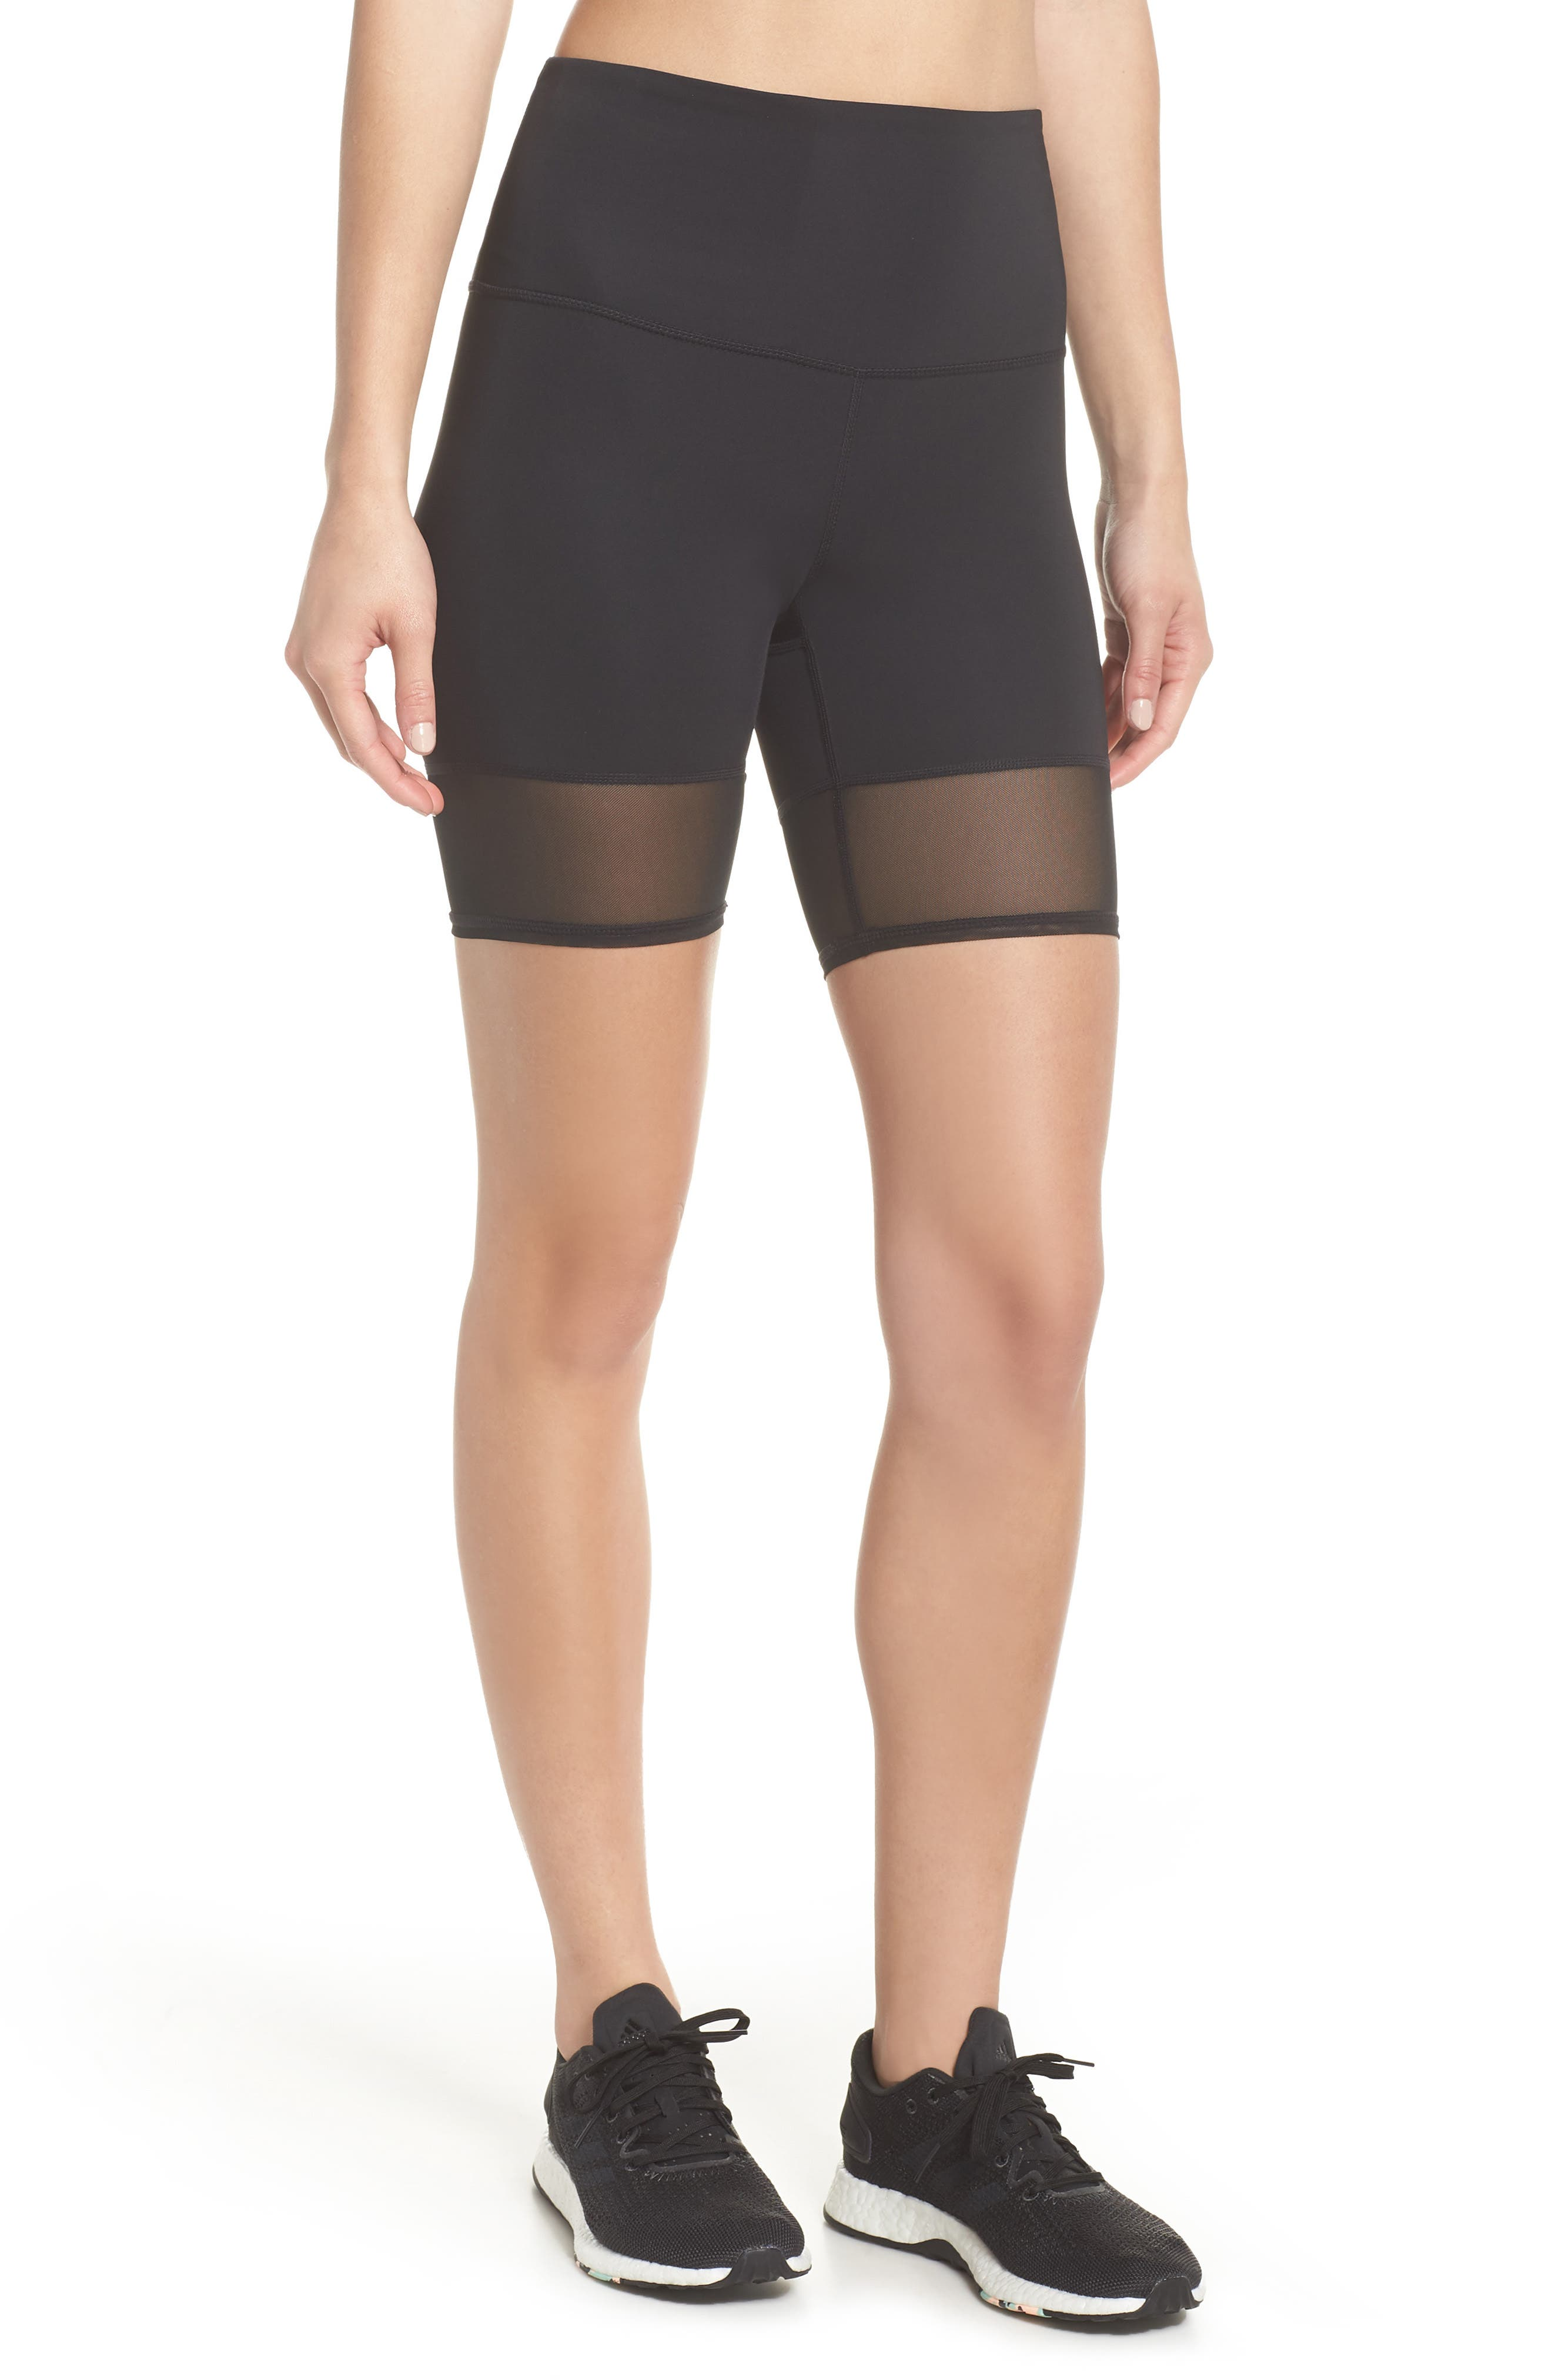 Mia Vision High Waist Mesh Bike Shorts,                         Main,                         color, 001